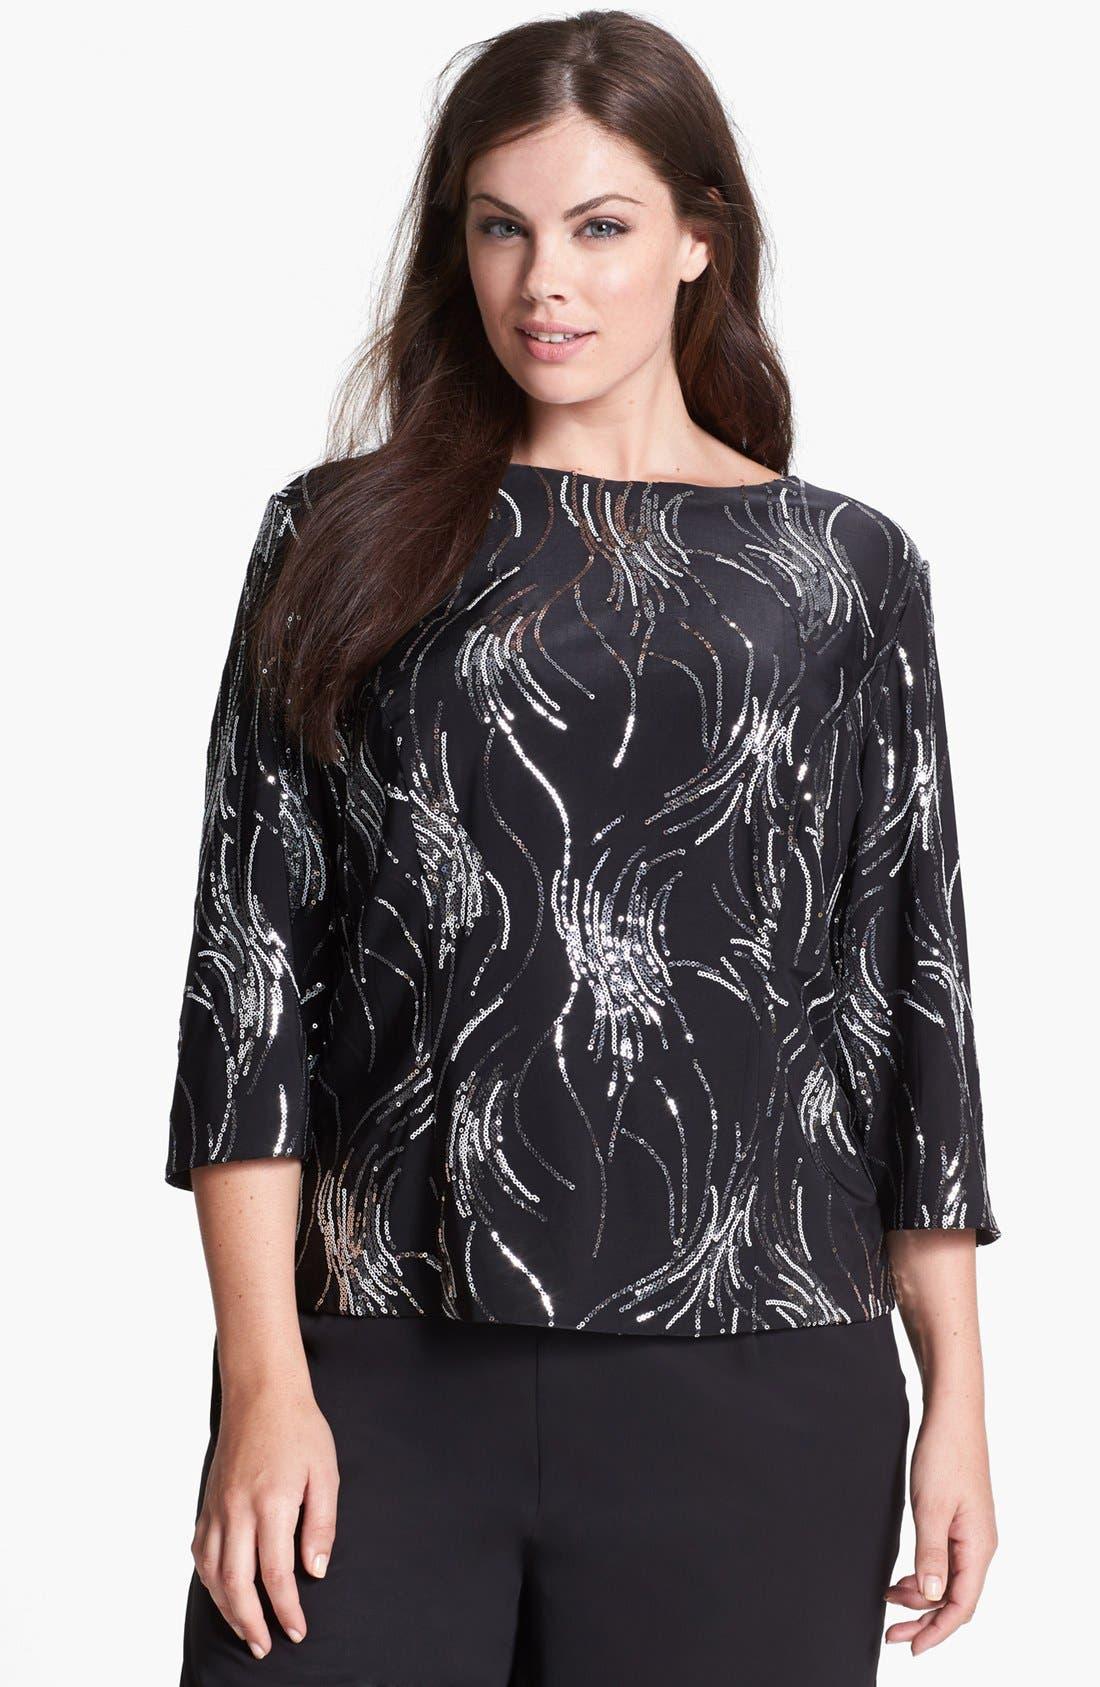 Alternate Image 1 Selected - Alex Evenings Sequin Embellished Blouse (Plus Size)